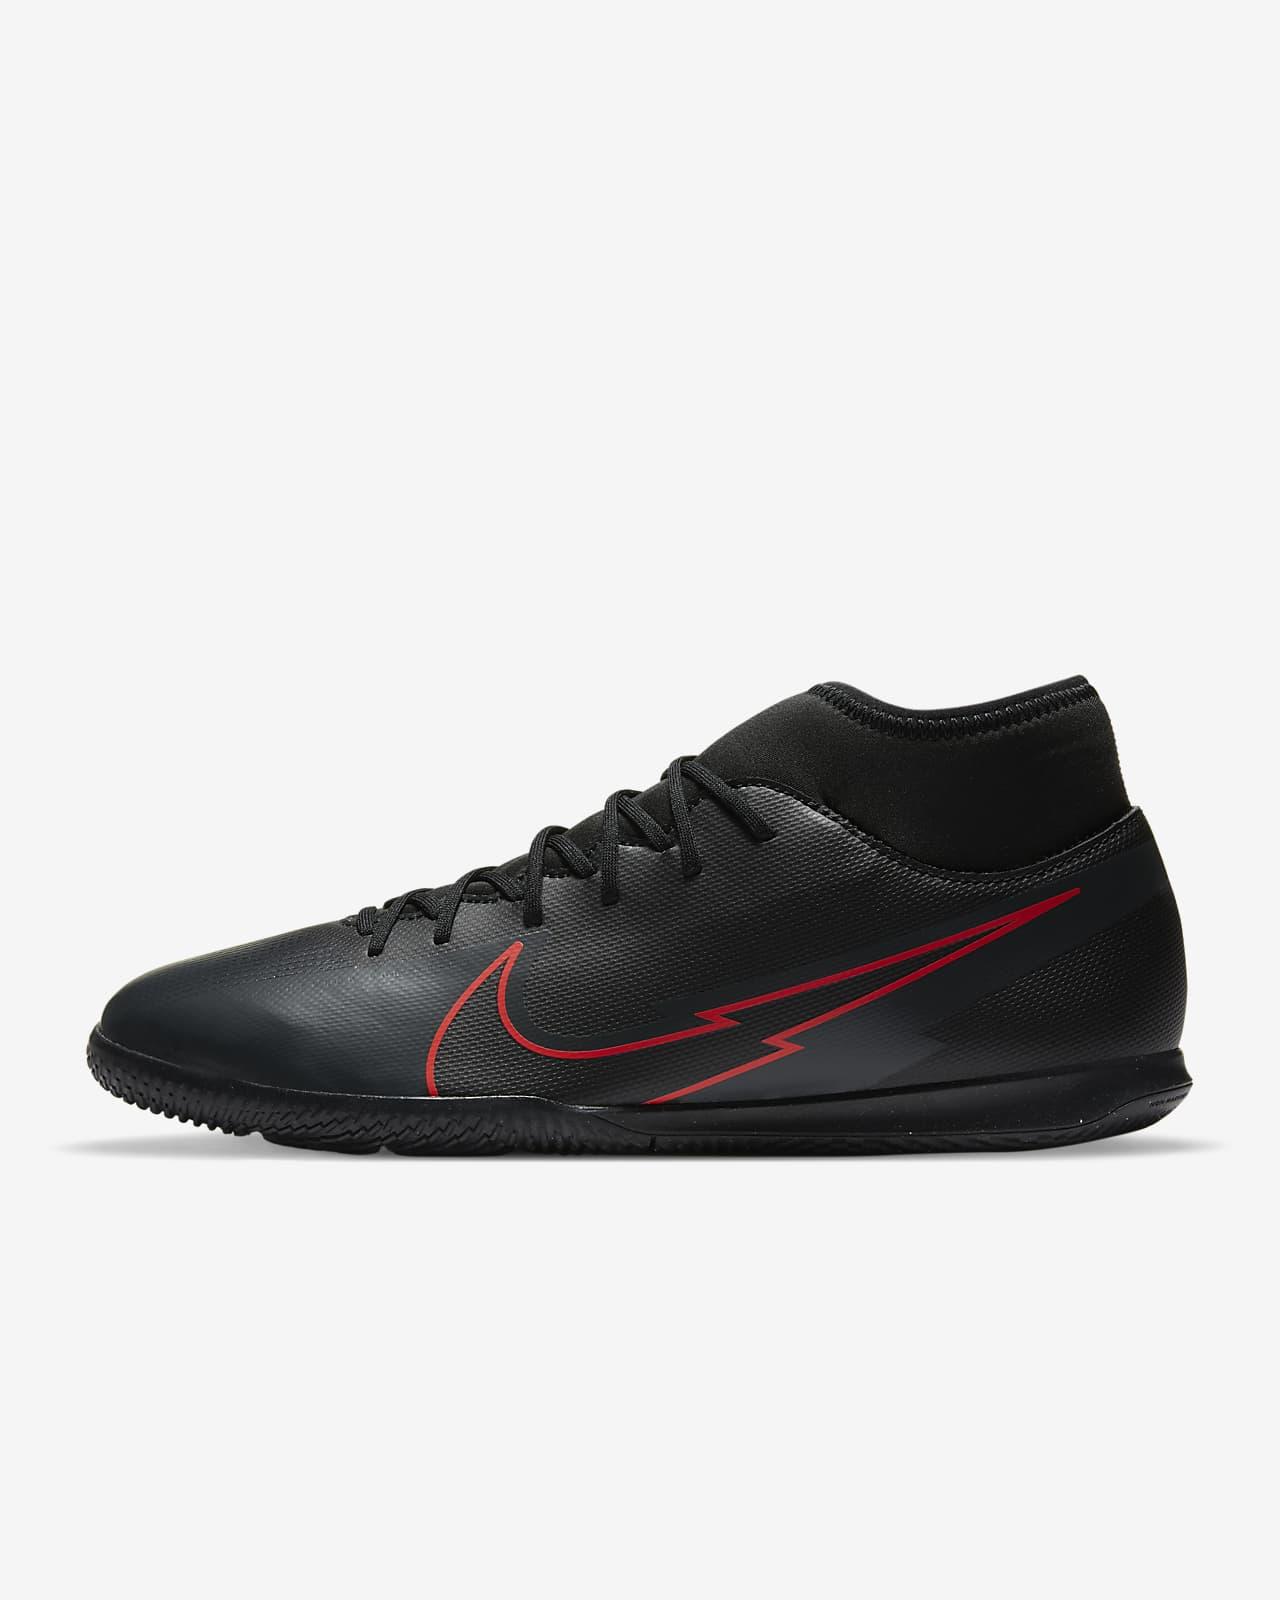 Nike Mercurial Superfly 7 Club IC Indoor/Court Football Shoe